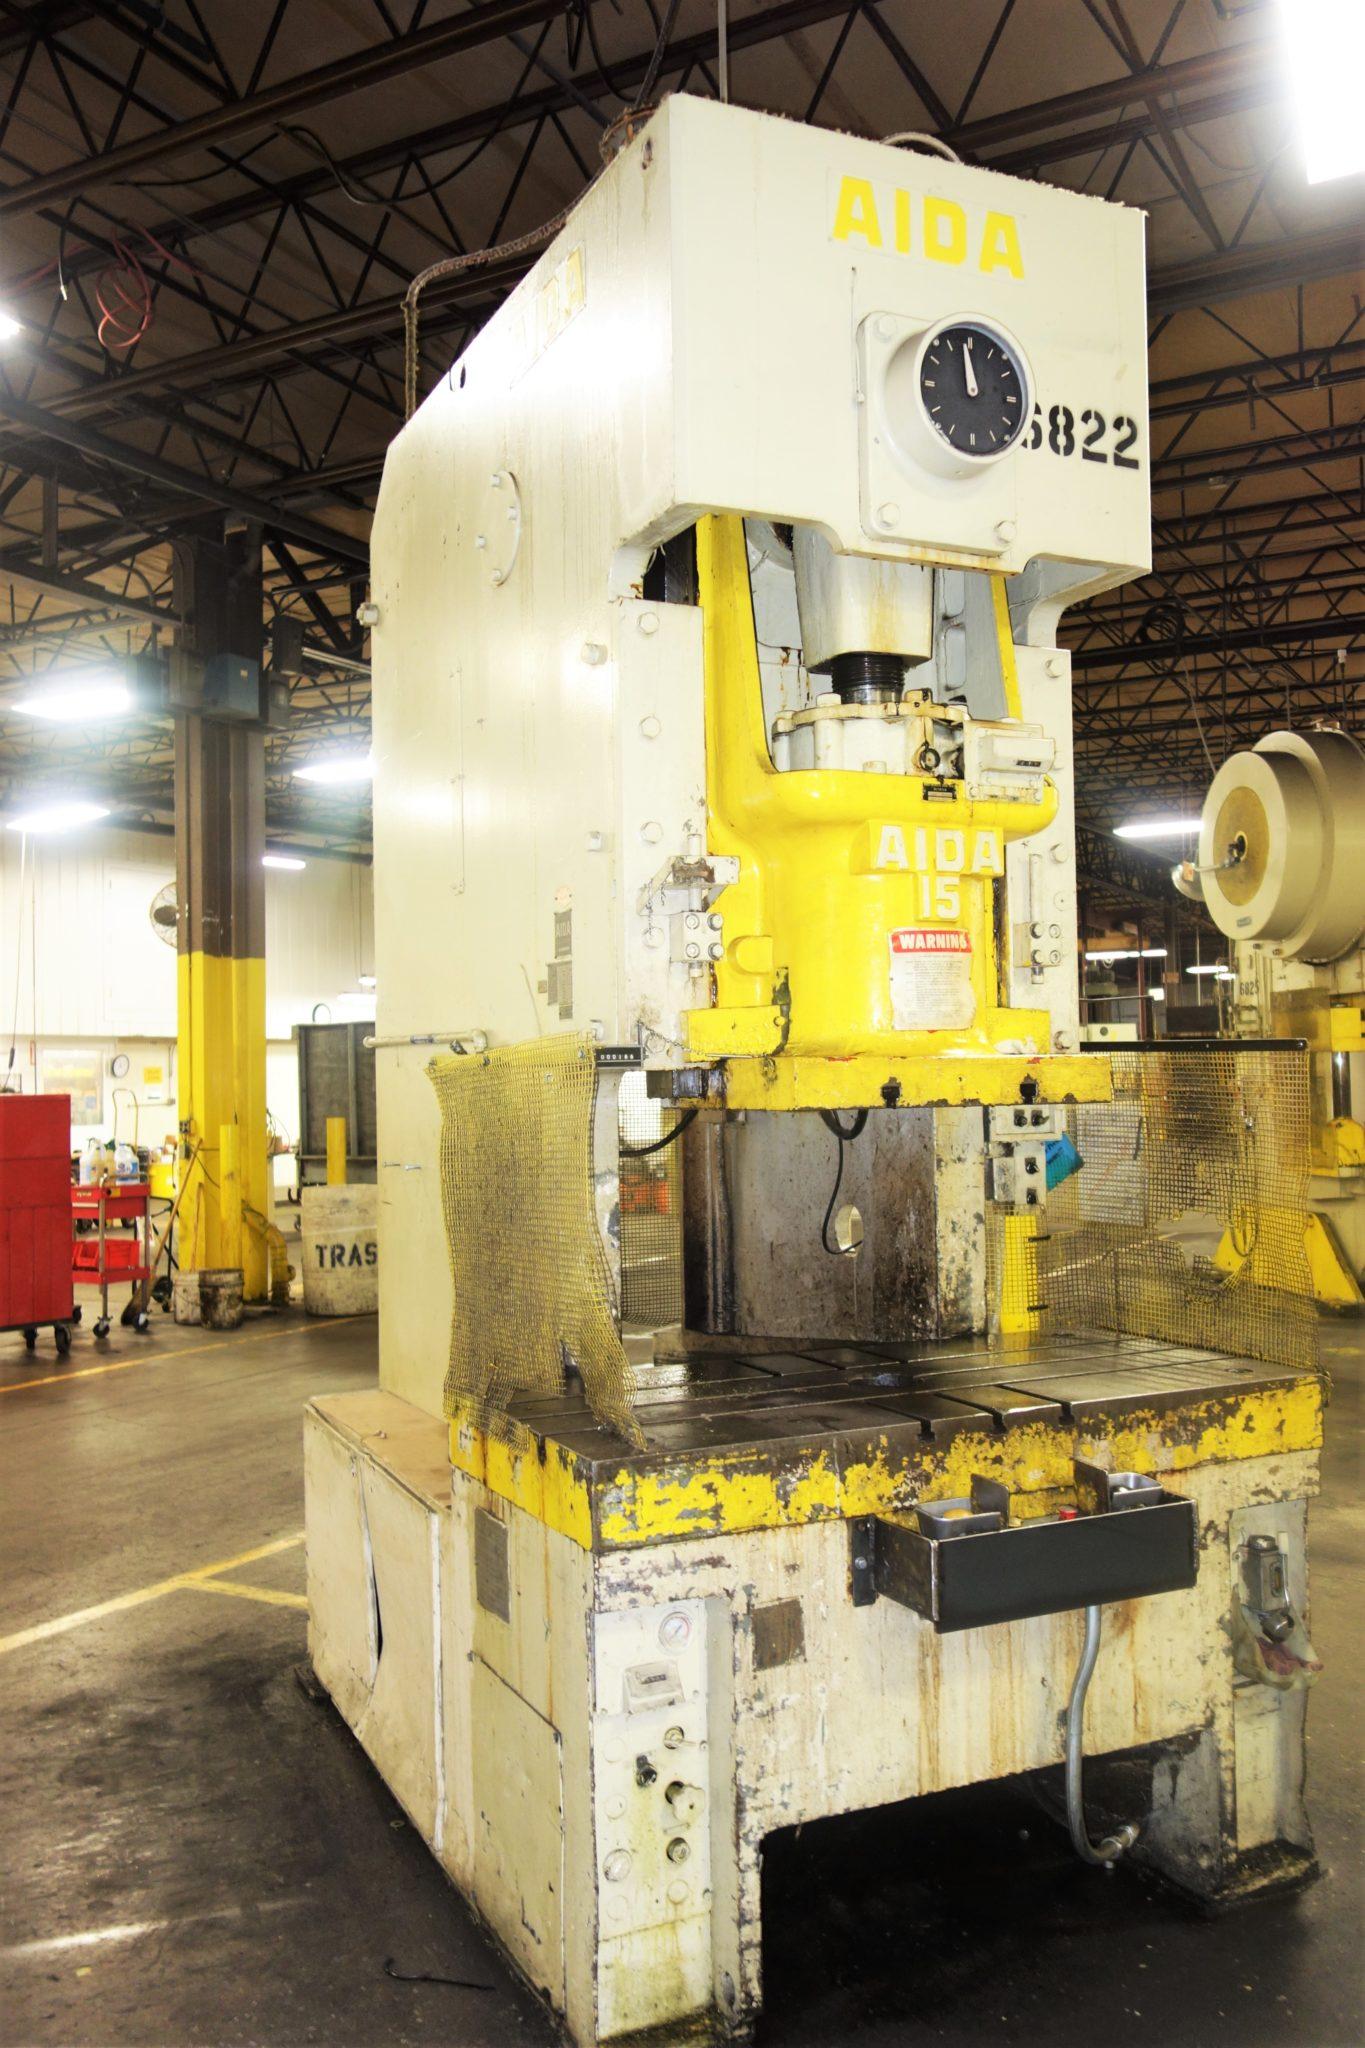 165 Ton Capacity Aida Single-Point Gap Frame Press For Sale